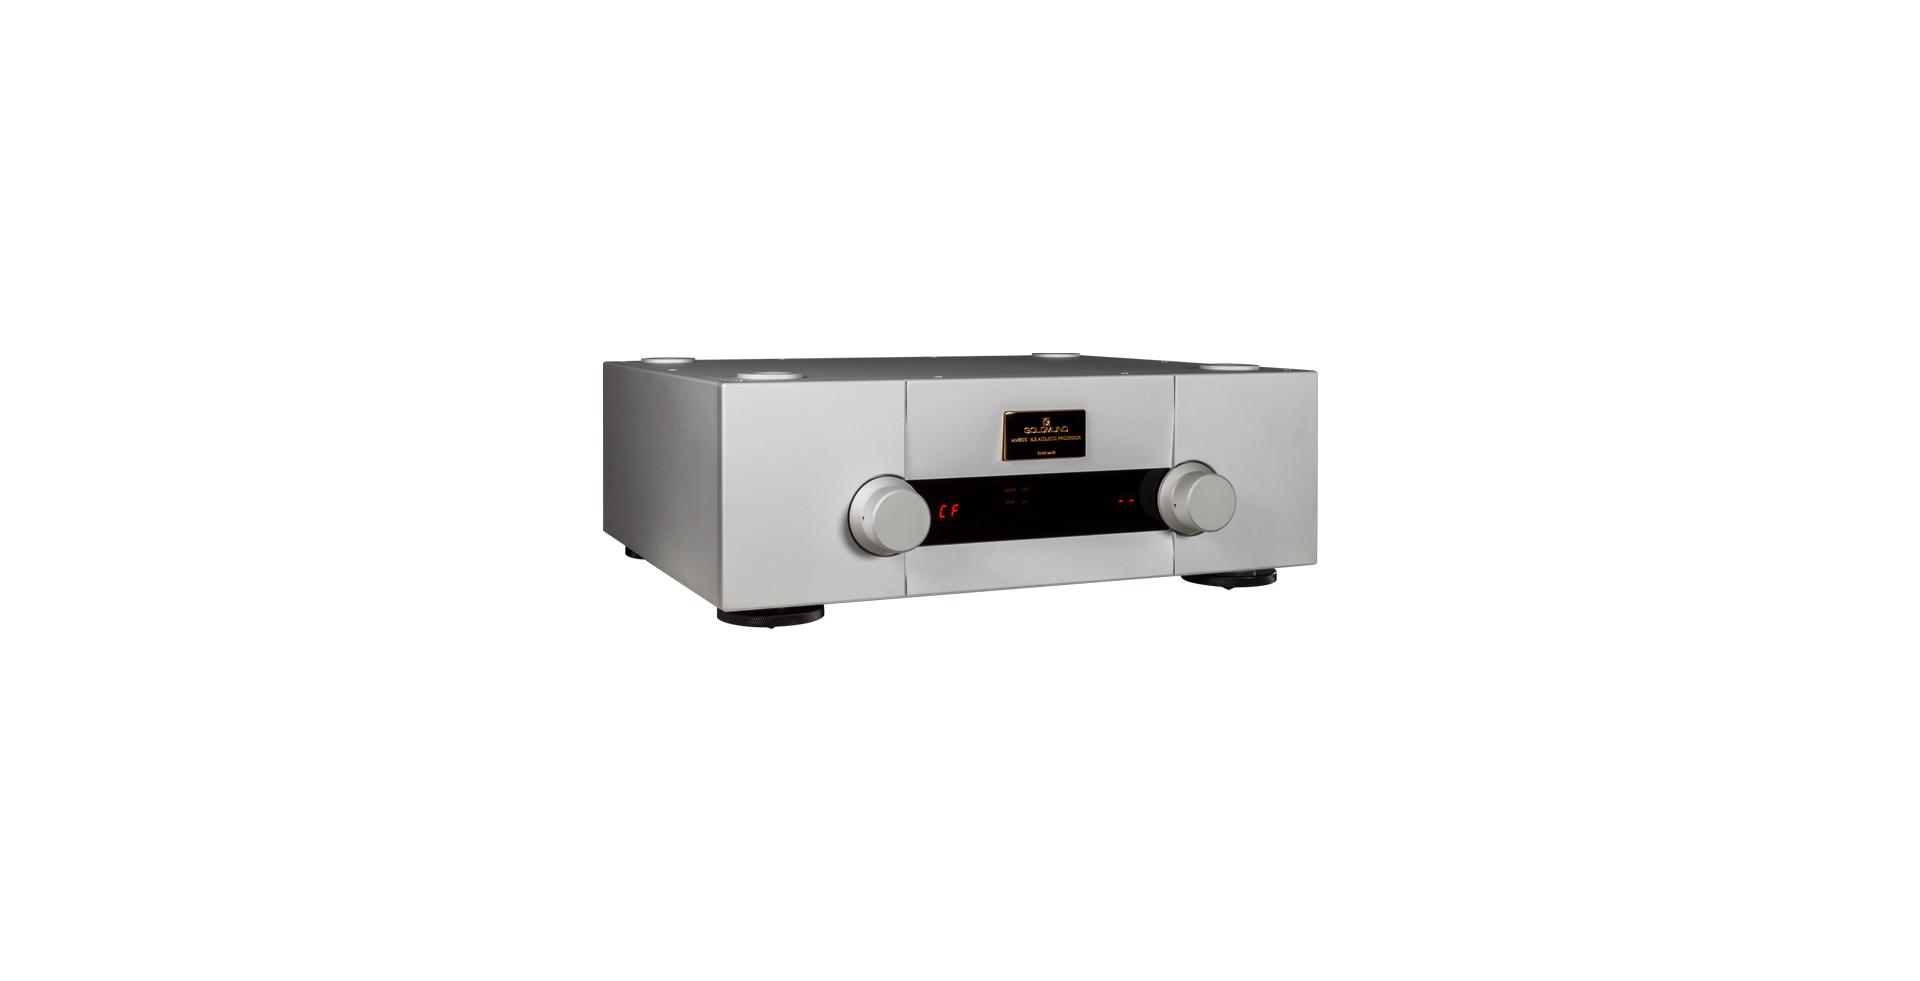 Mimesis16.8 audio processor home theatre